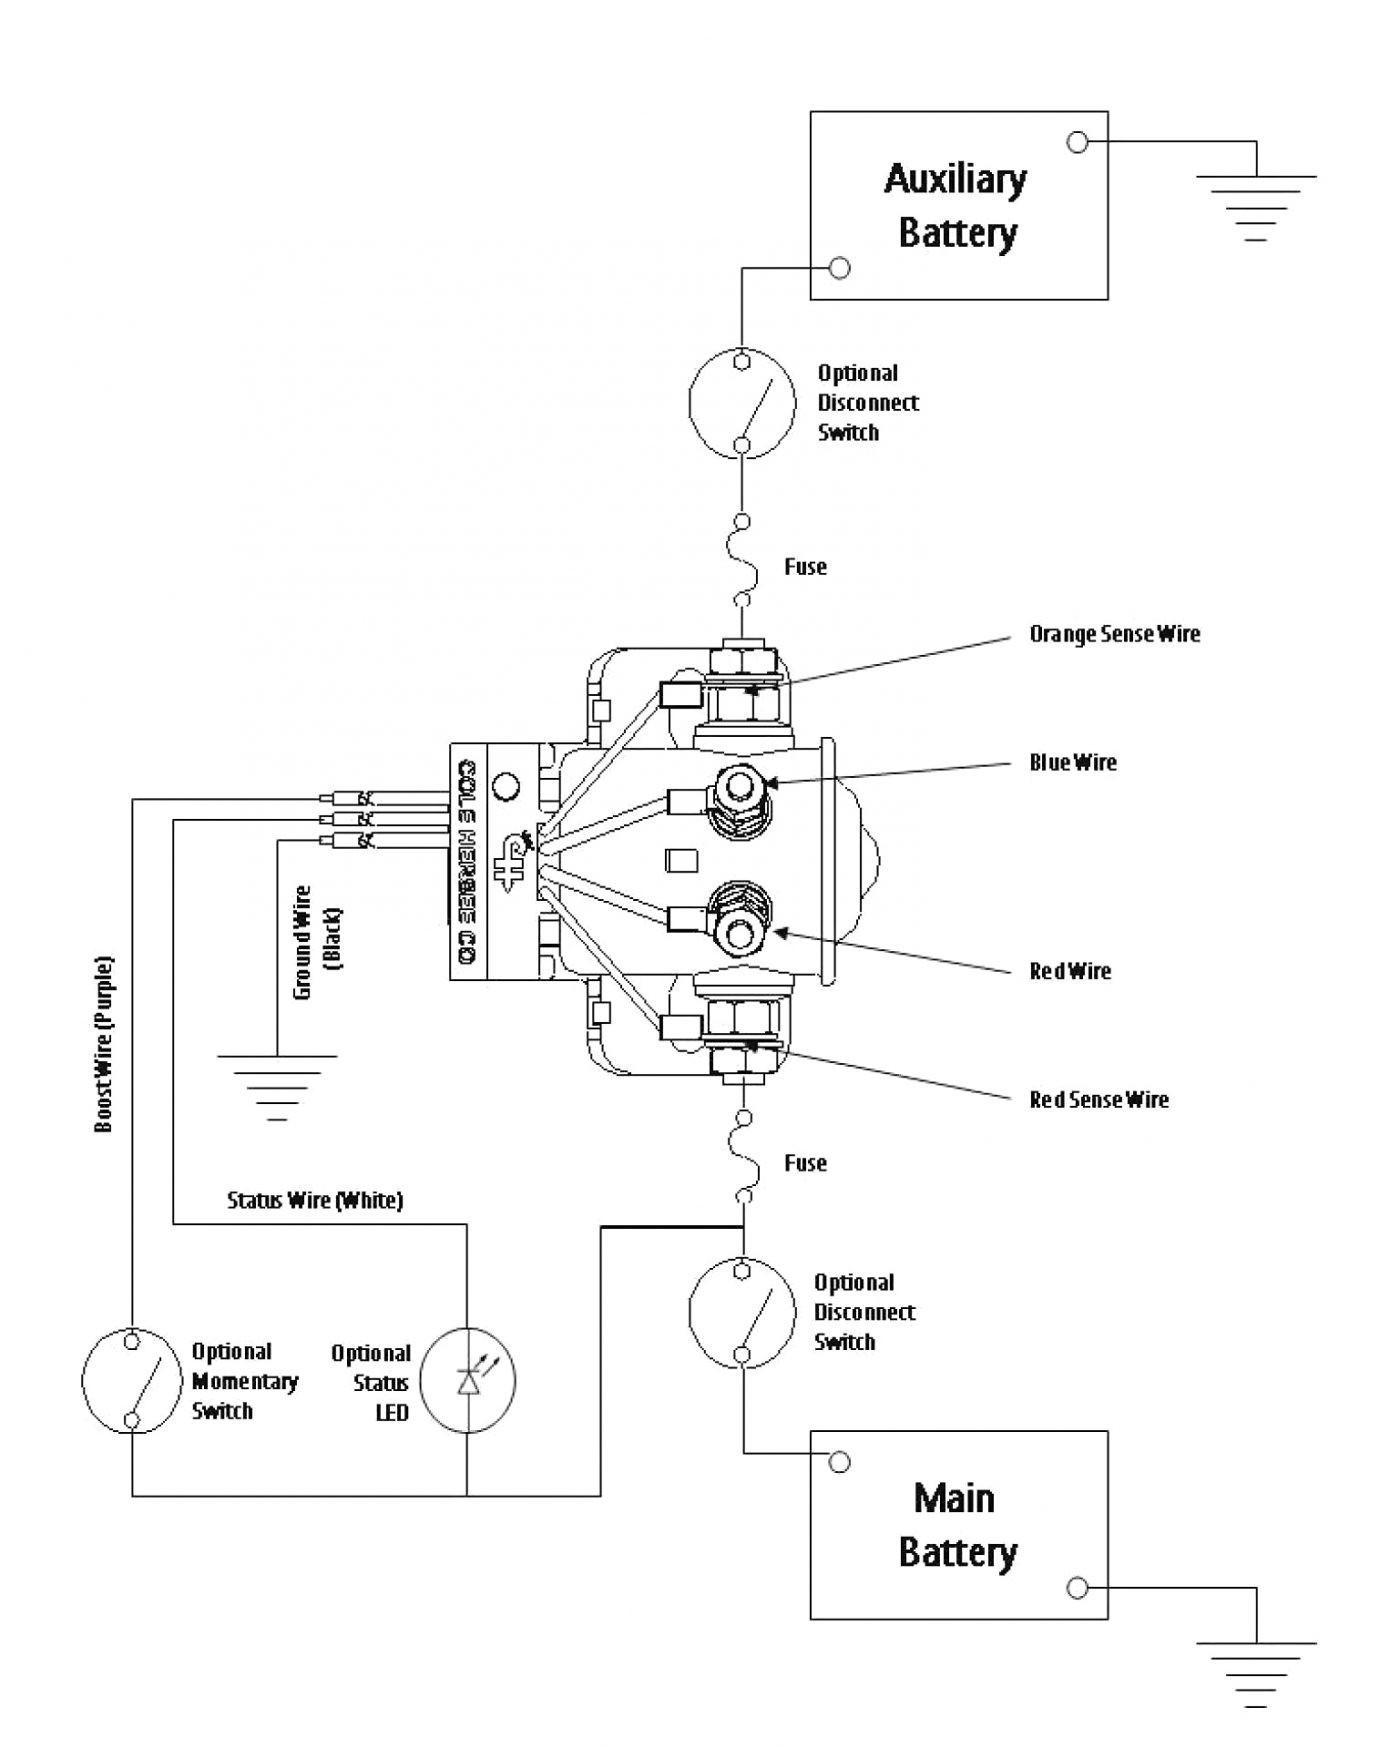 2003 Chevy Tahoe Trailer Wiring Diagram